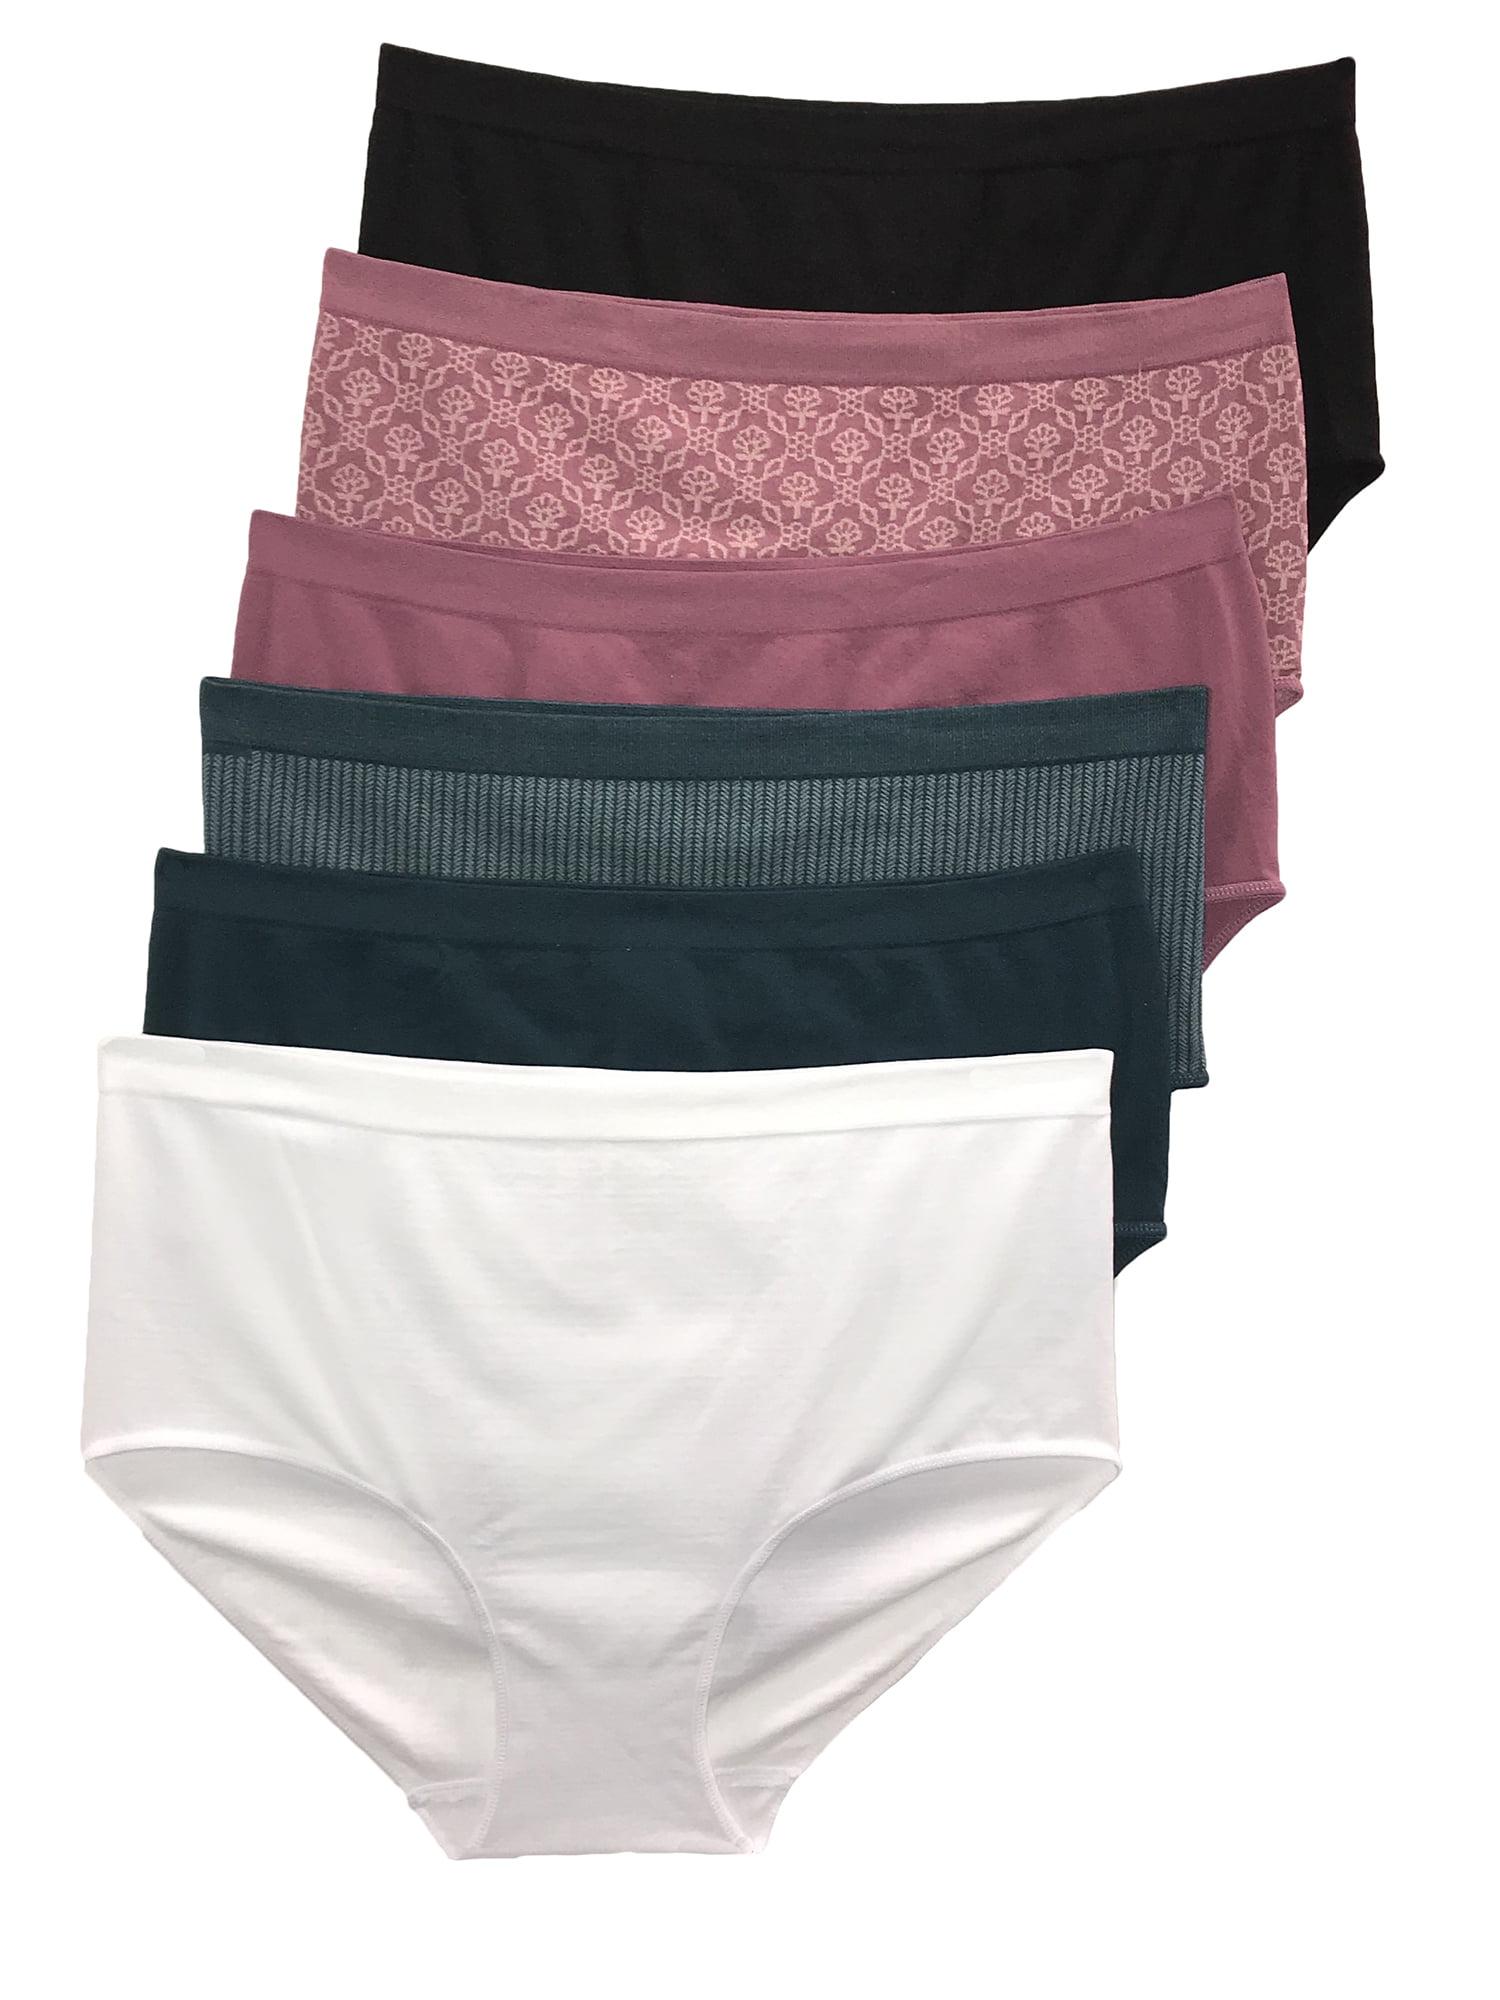 College Pro Panties